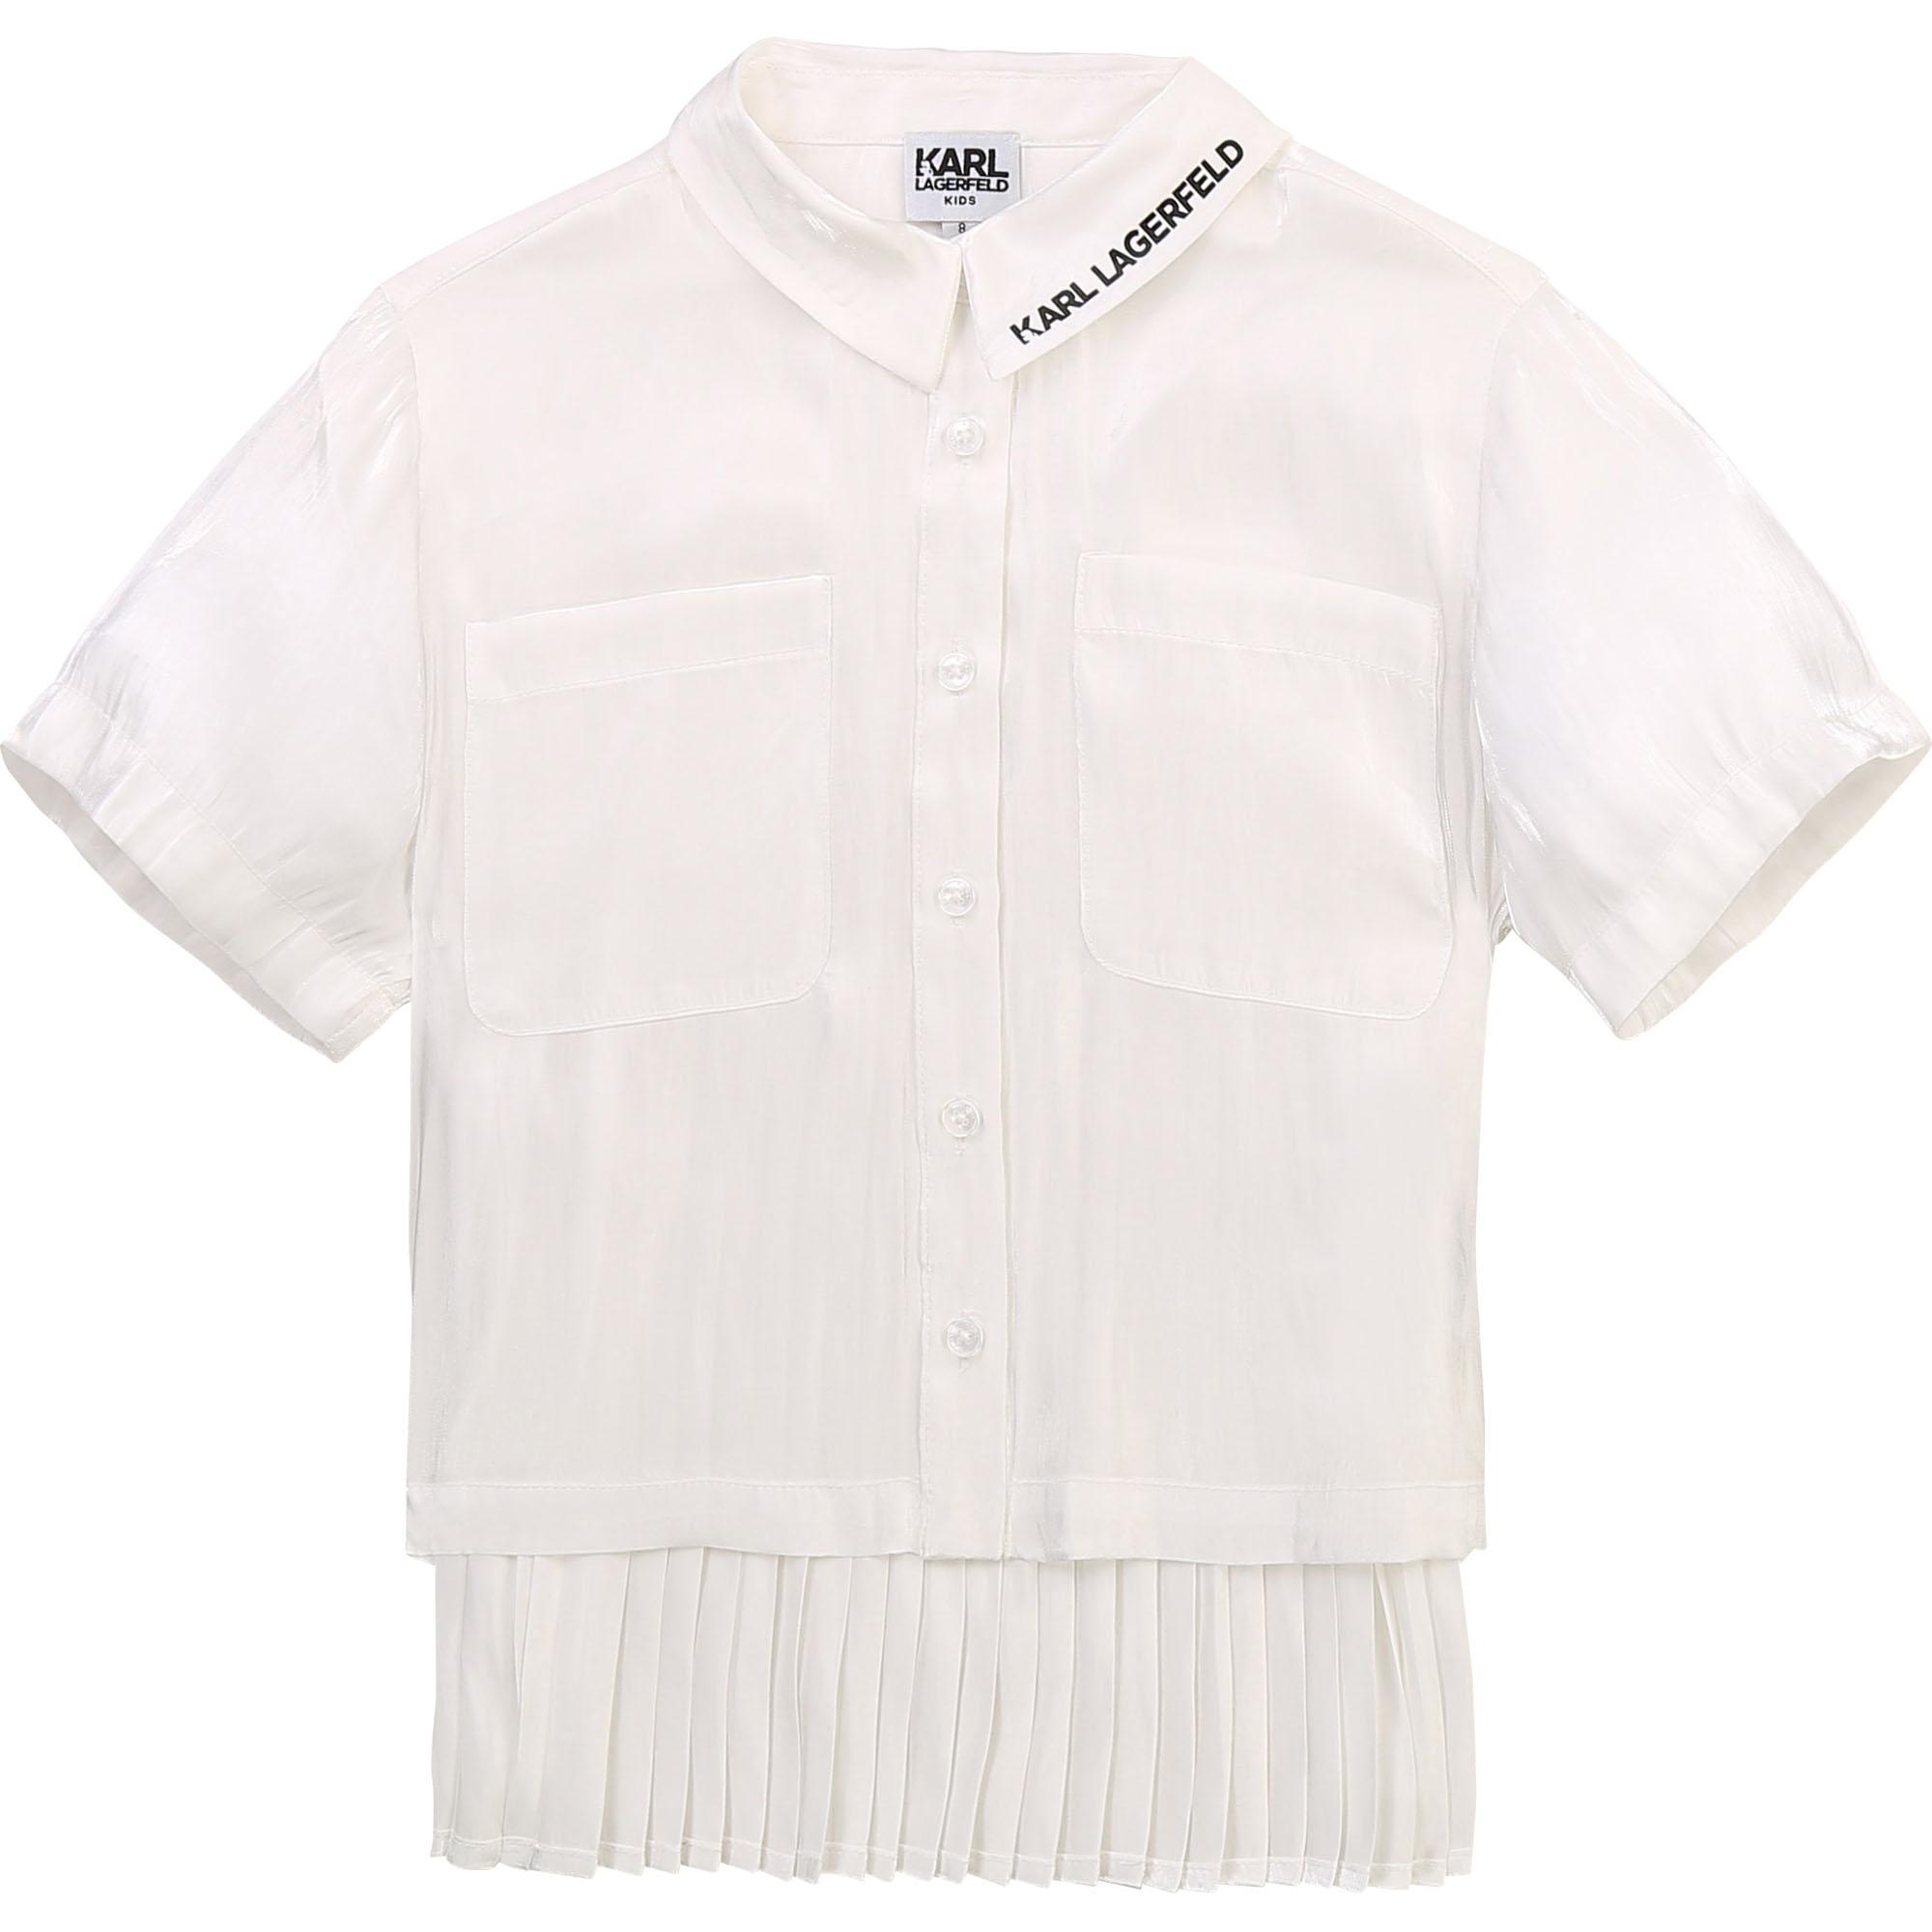 Chemise à manches courtes KARL LAGERFELD KIDS pour FILLE